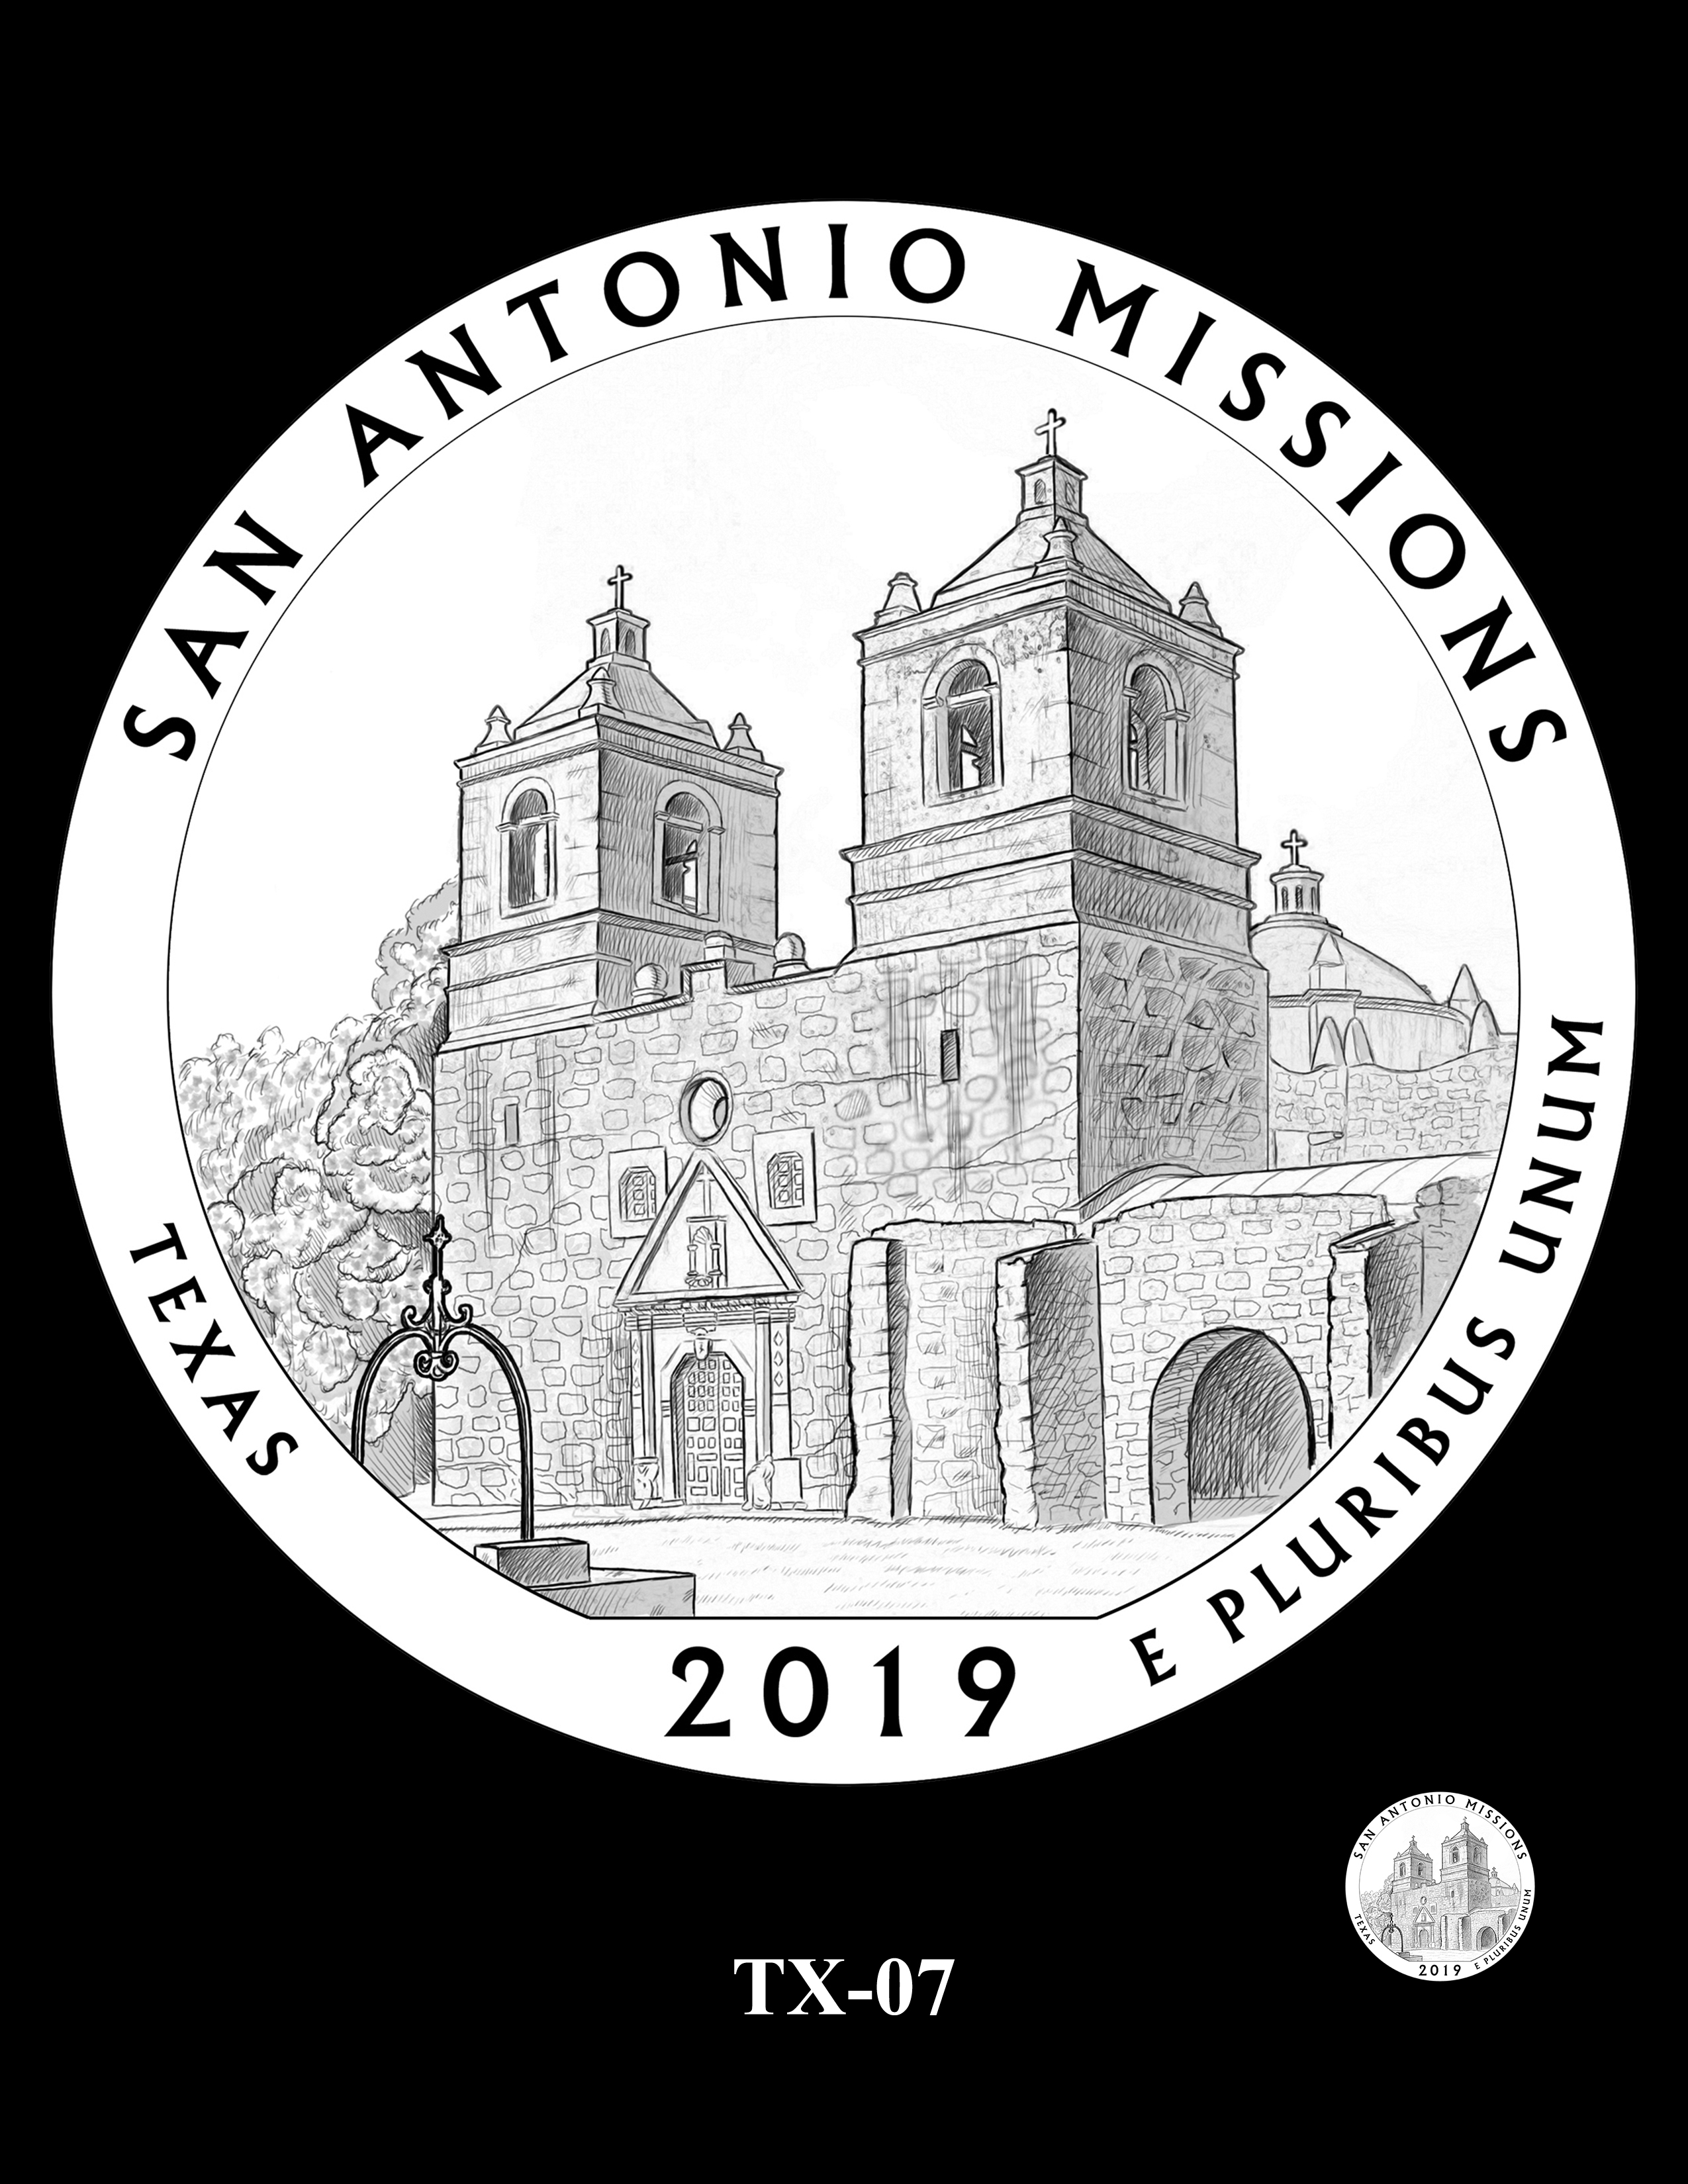 TX-07 -- 2019 America the Beautiful Quarters® Program